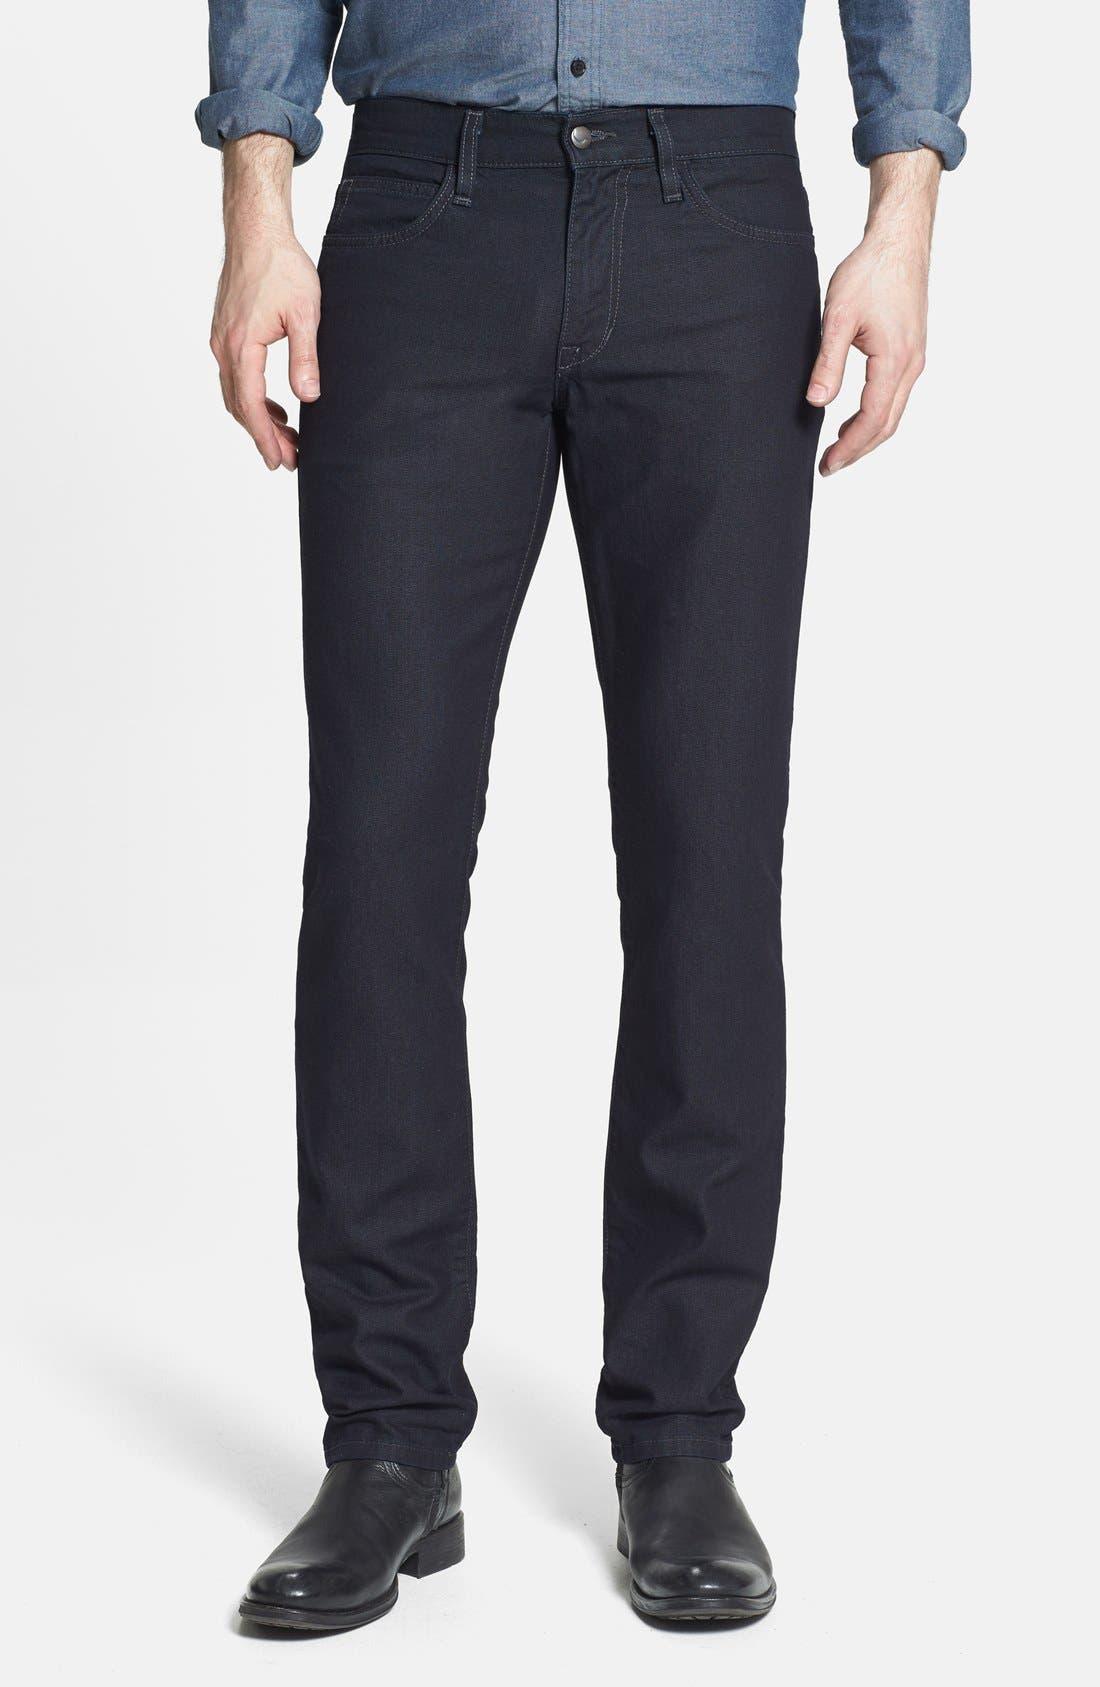 Main Image - Joe's 'Slim' Skinny Fit Jeans (Deandre)